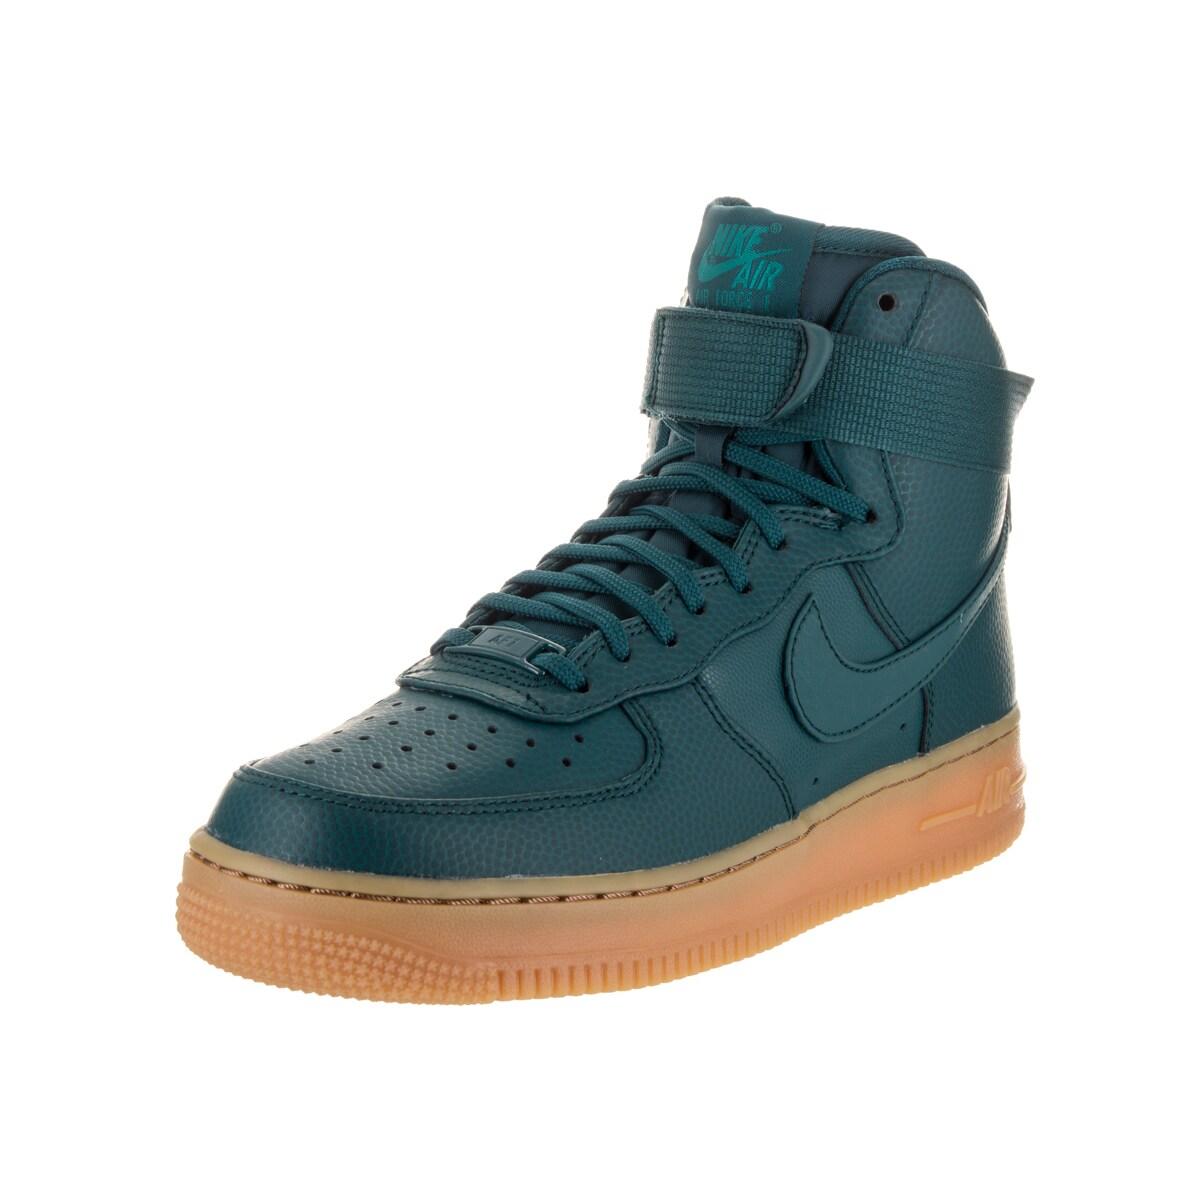 Nike Women's Air Force 1 Hi SE Blue Leather Basketball Sh...